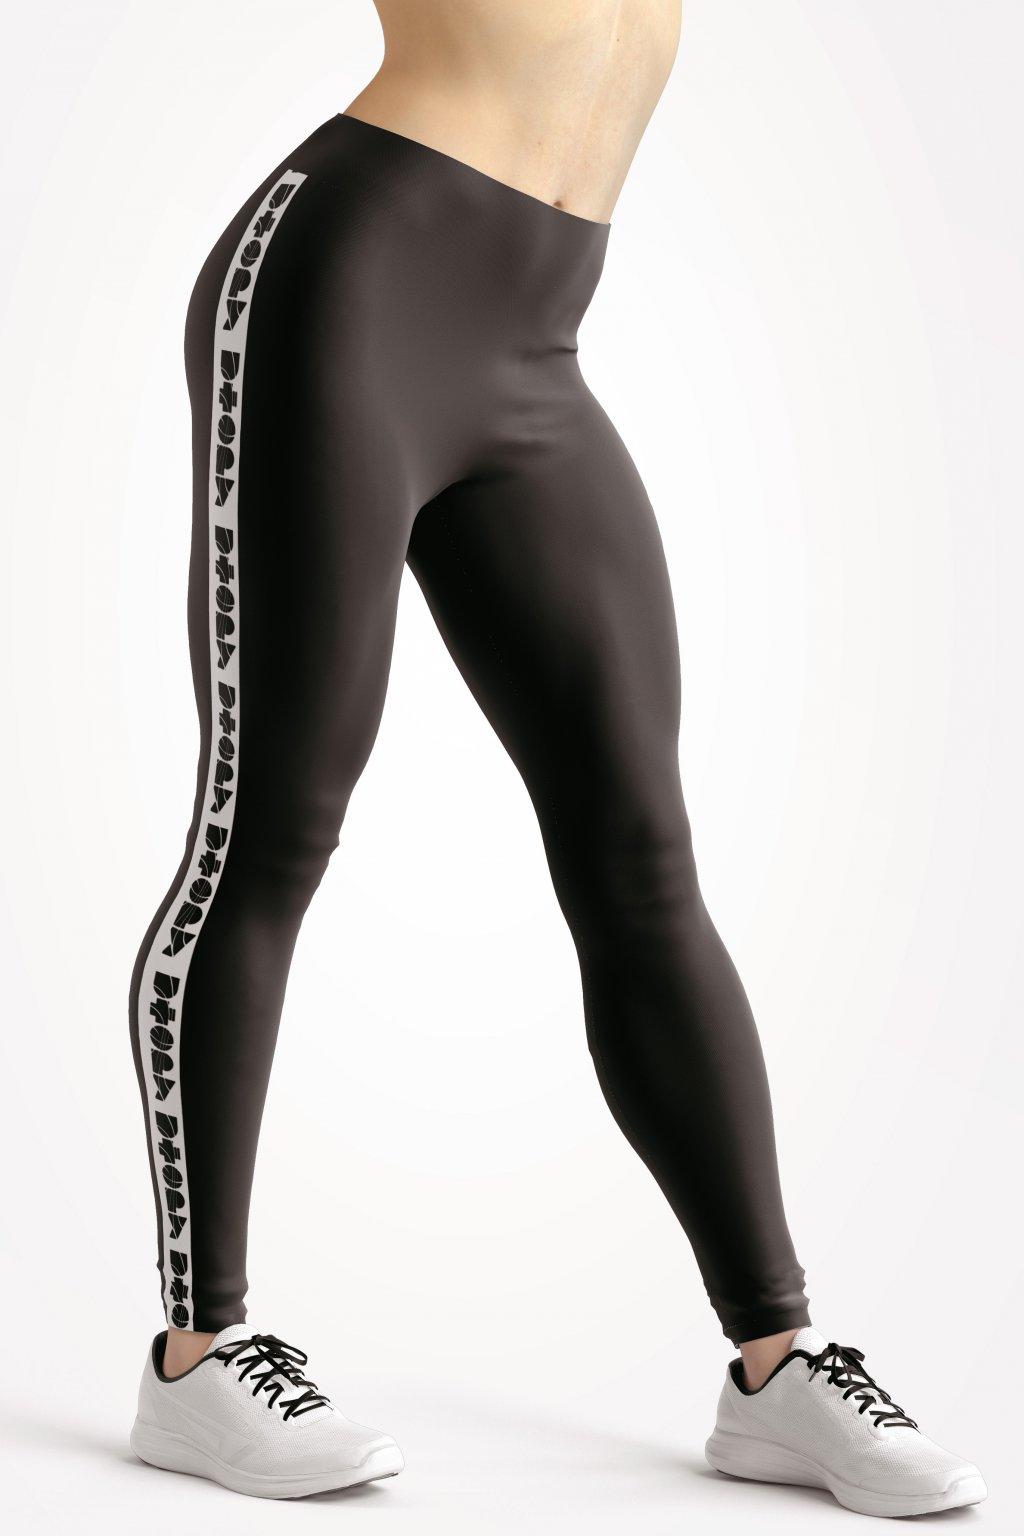 basic collection black utopy leggings front by utopy v2